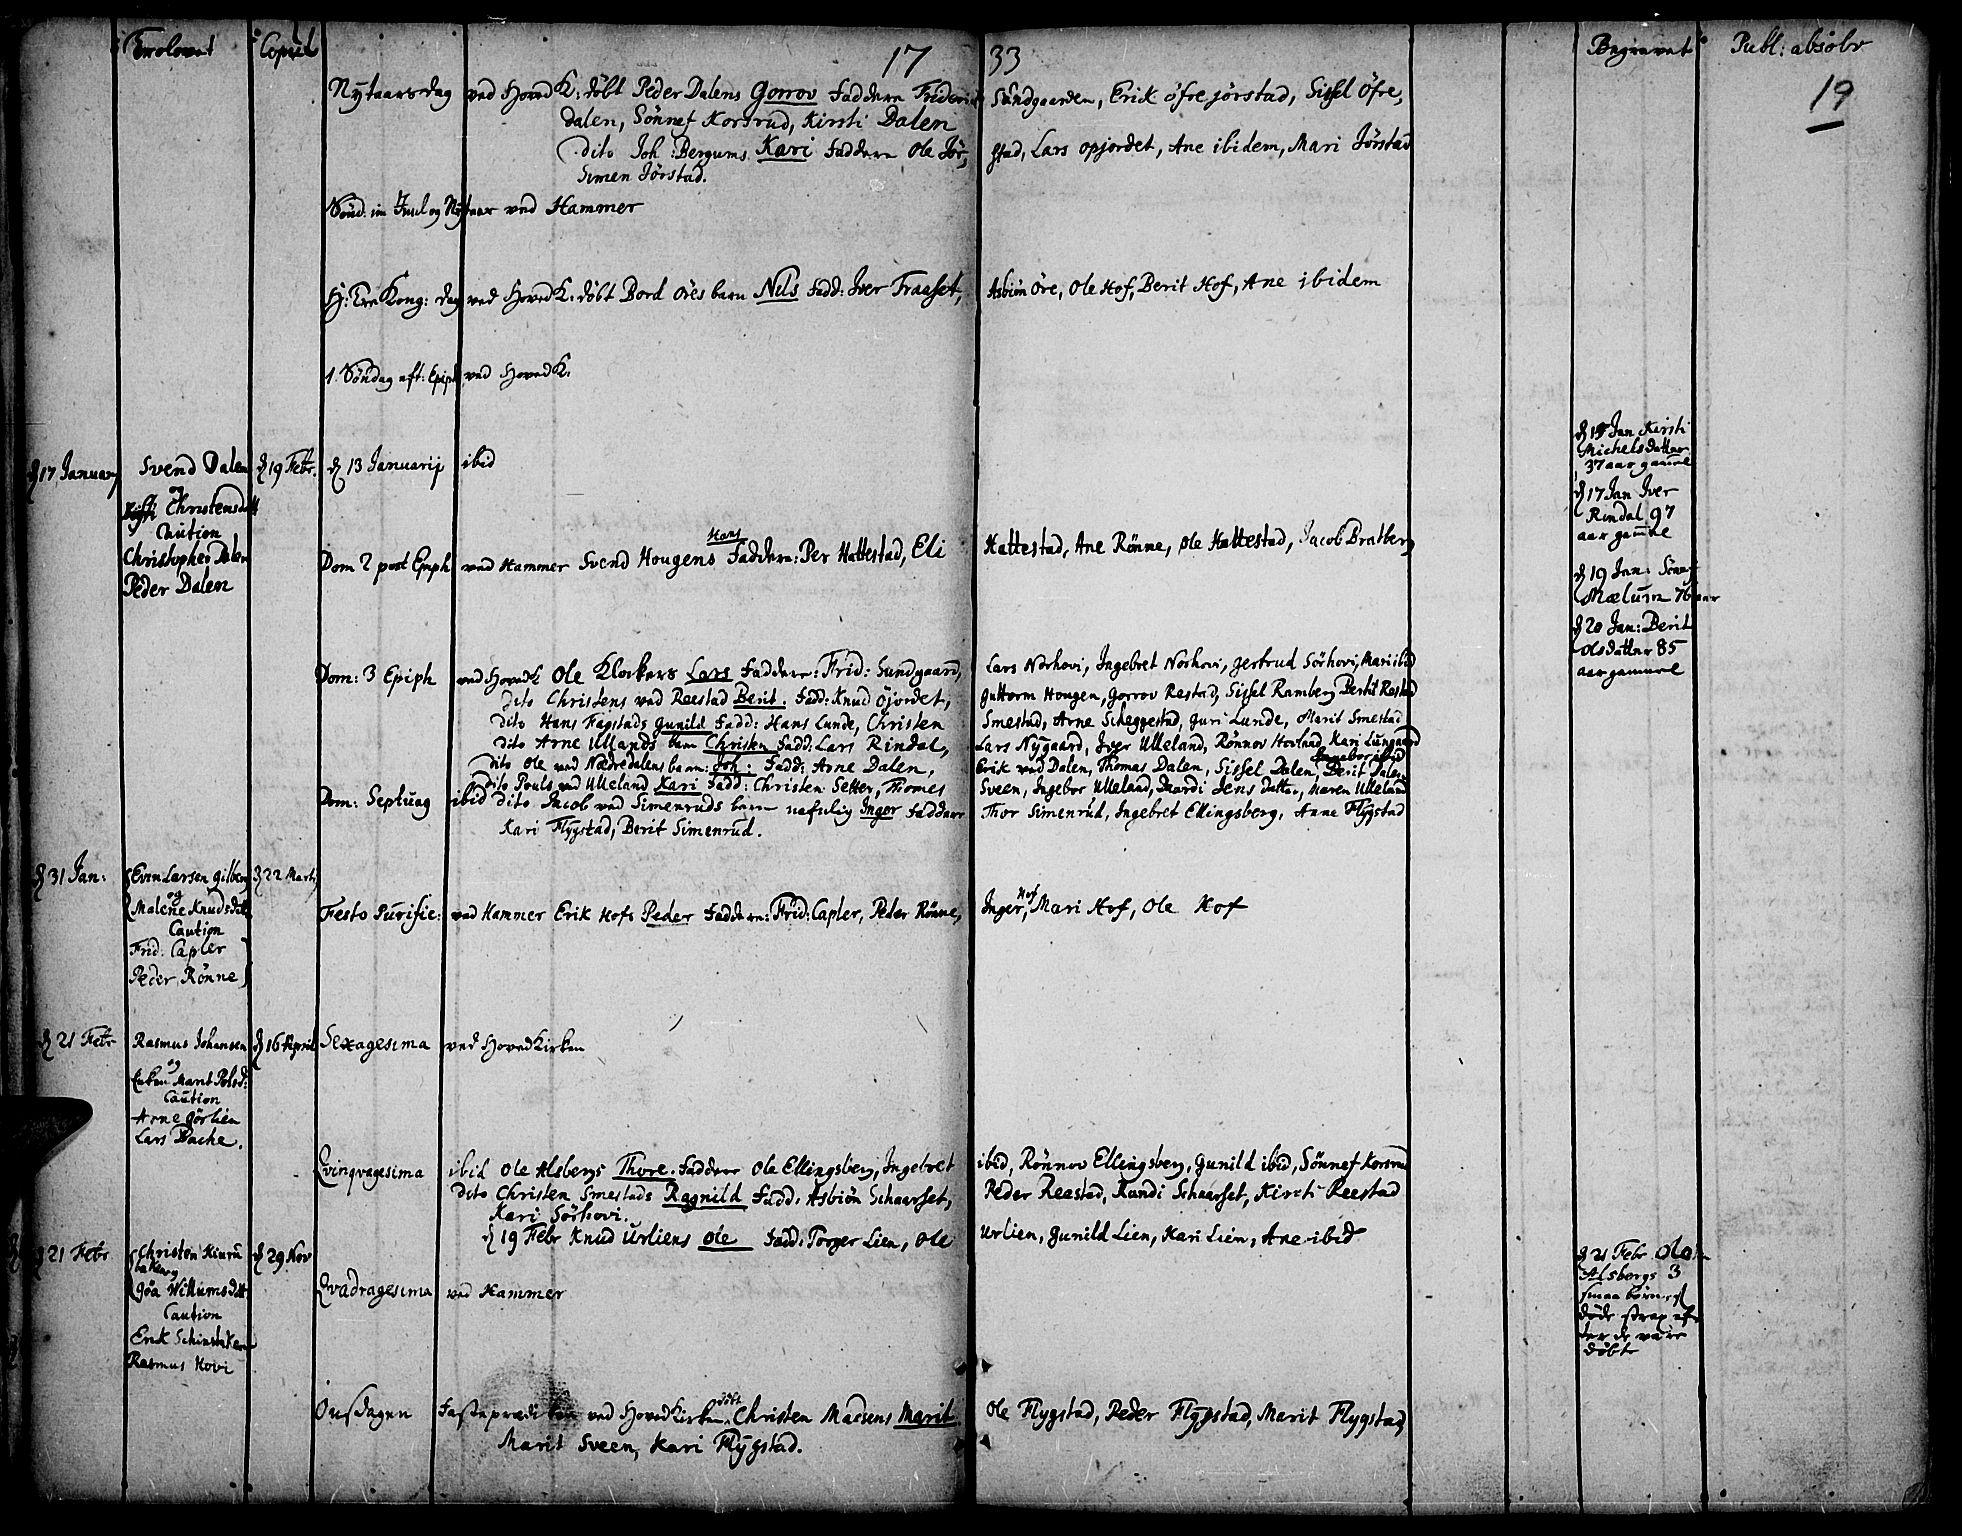 SAH, Fåberg prestekontor, Ministerialbok nr. 1, 1727-1775, s. 19